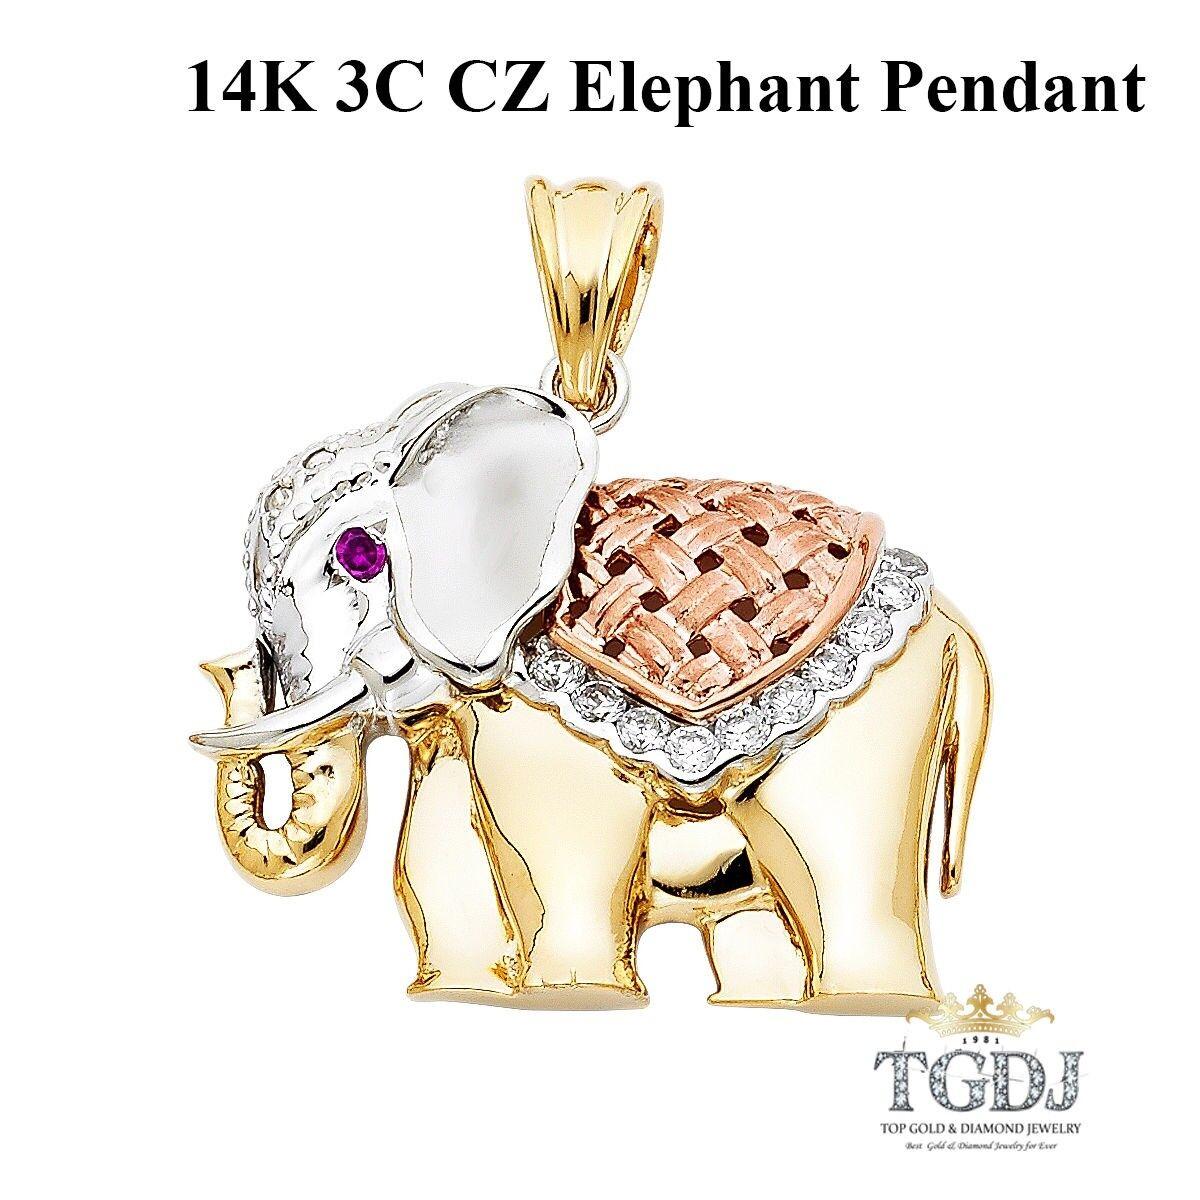 14K 3C CZ Elephant Pendant Height 27 MM Width 33 MM